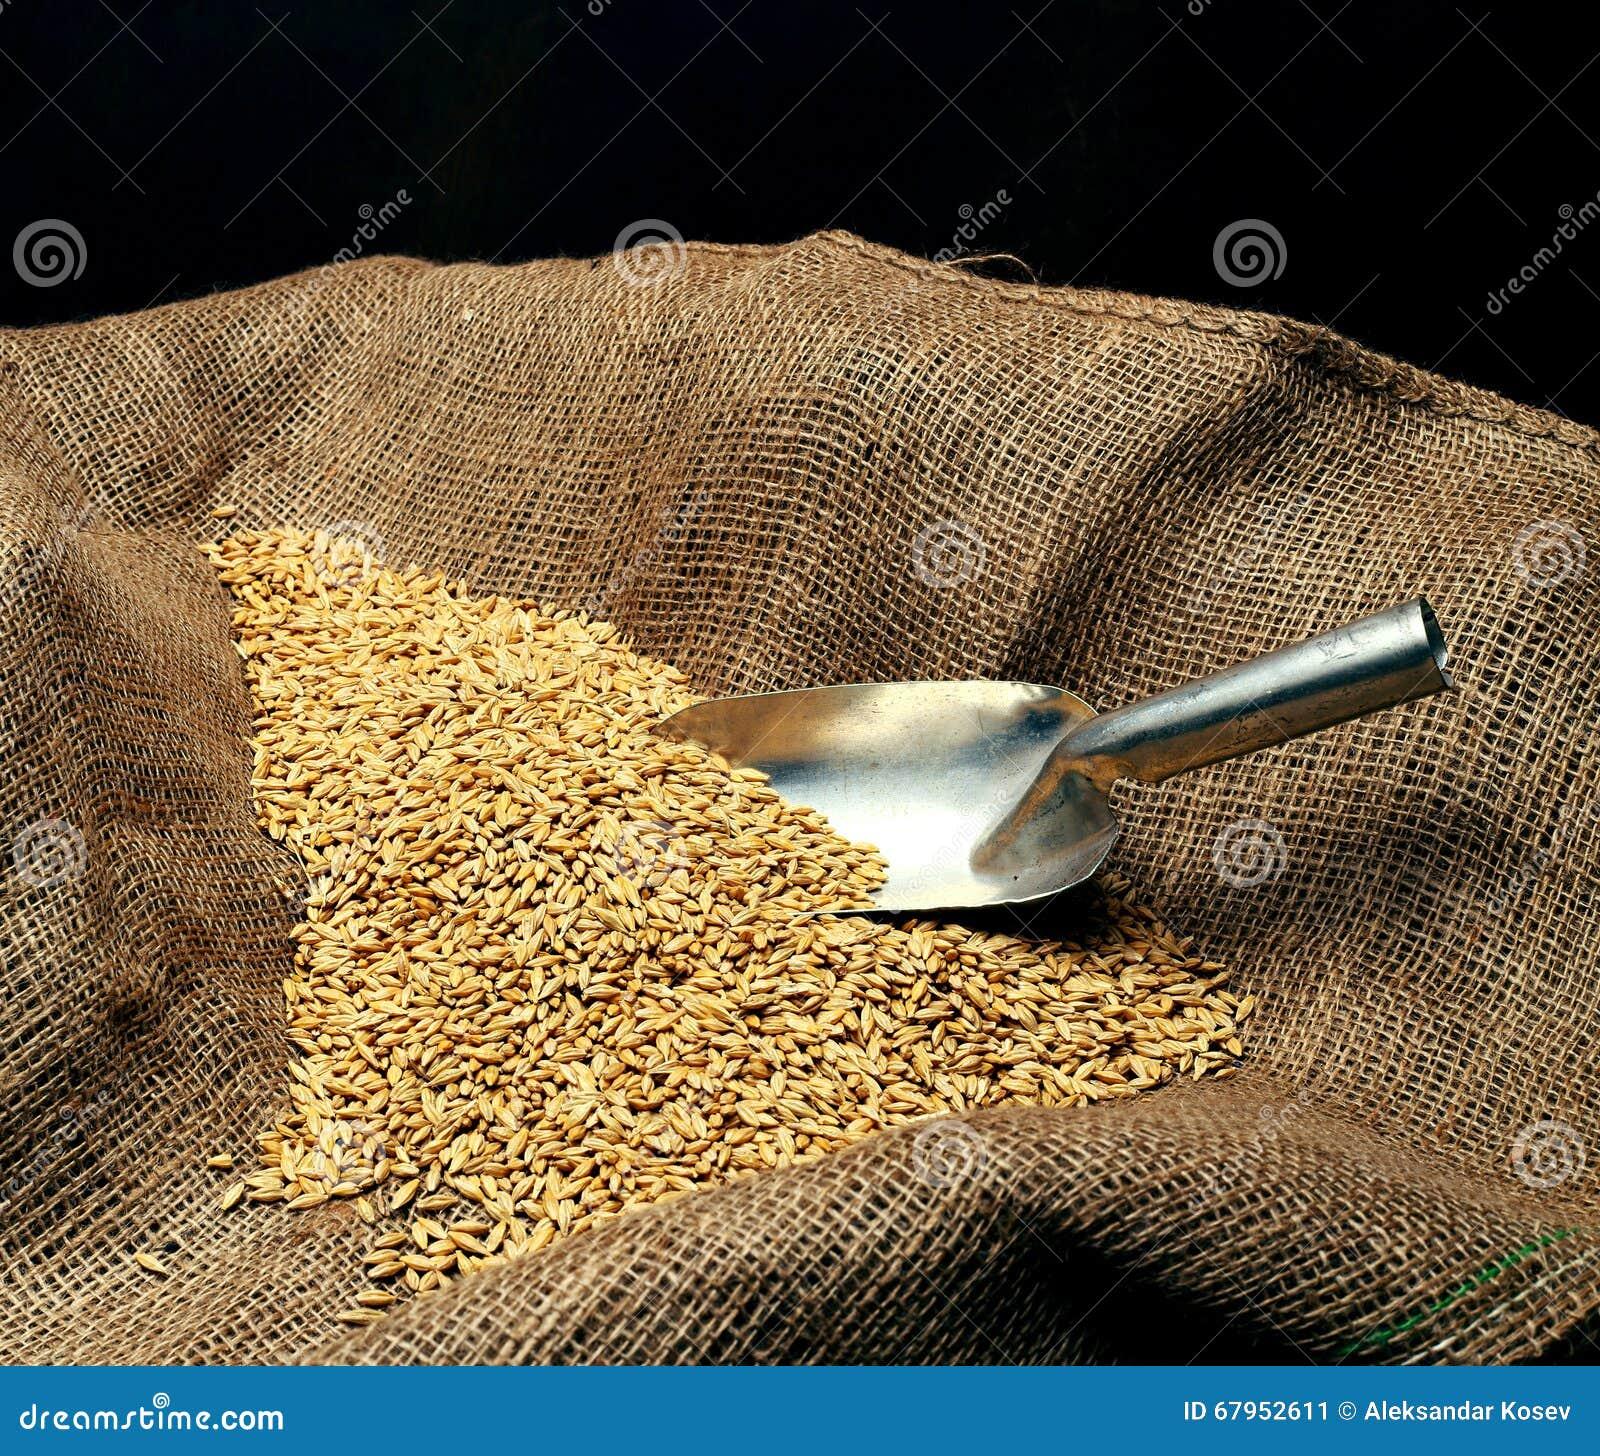 Germen de la siembra del trigo